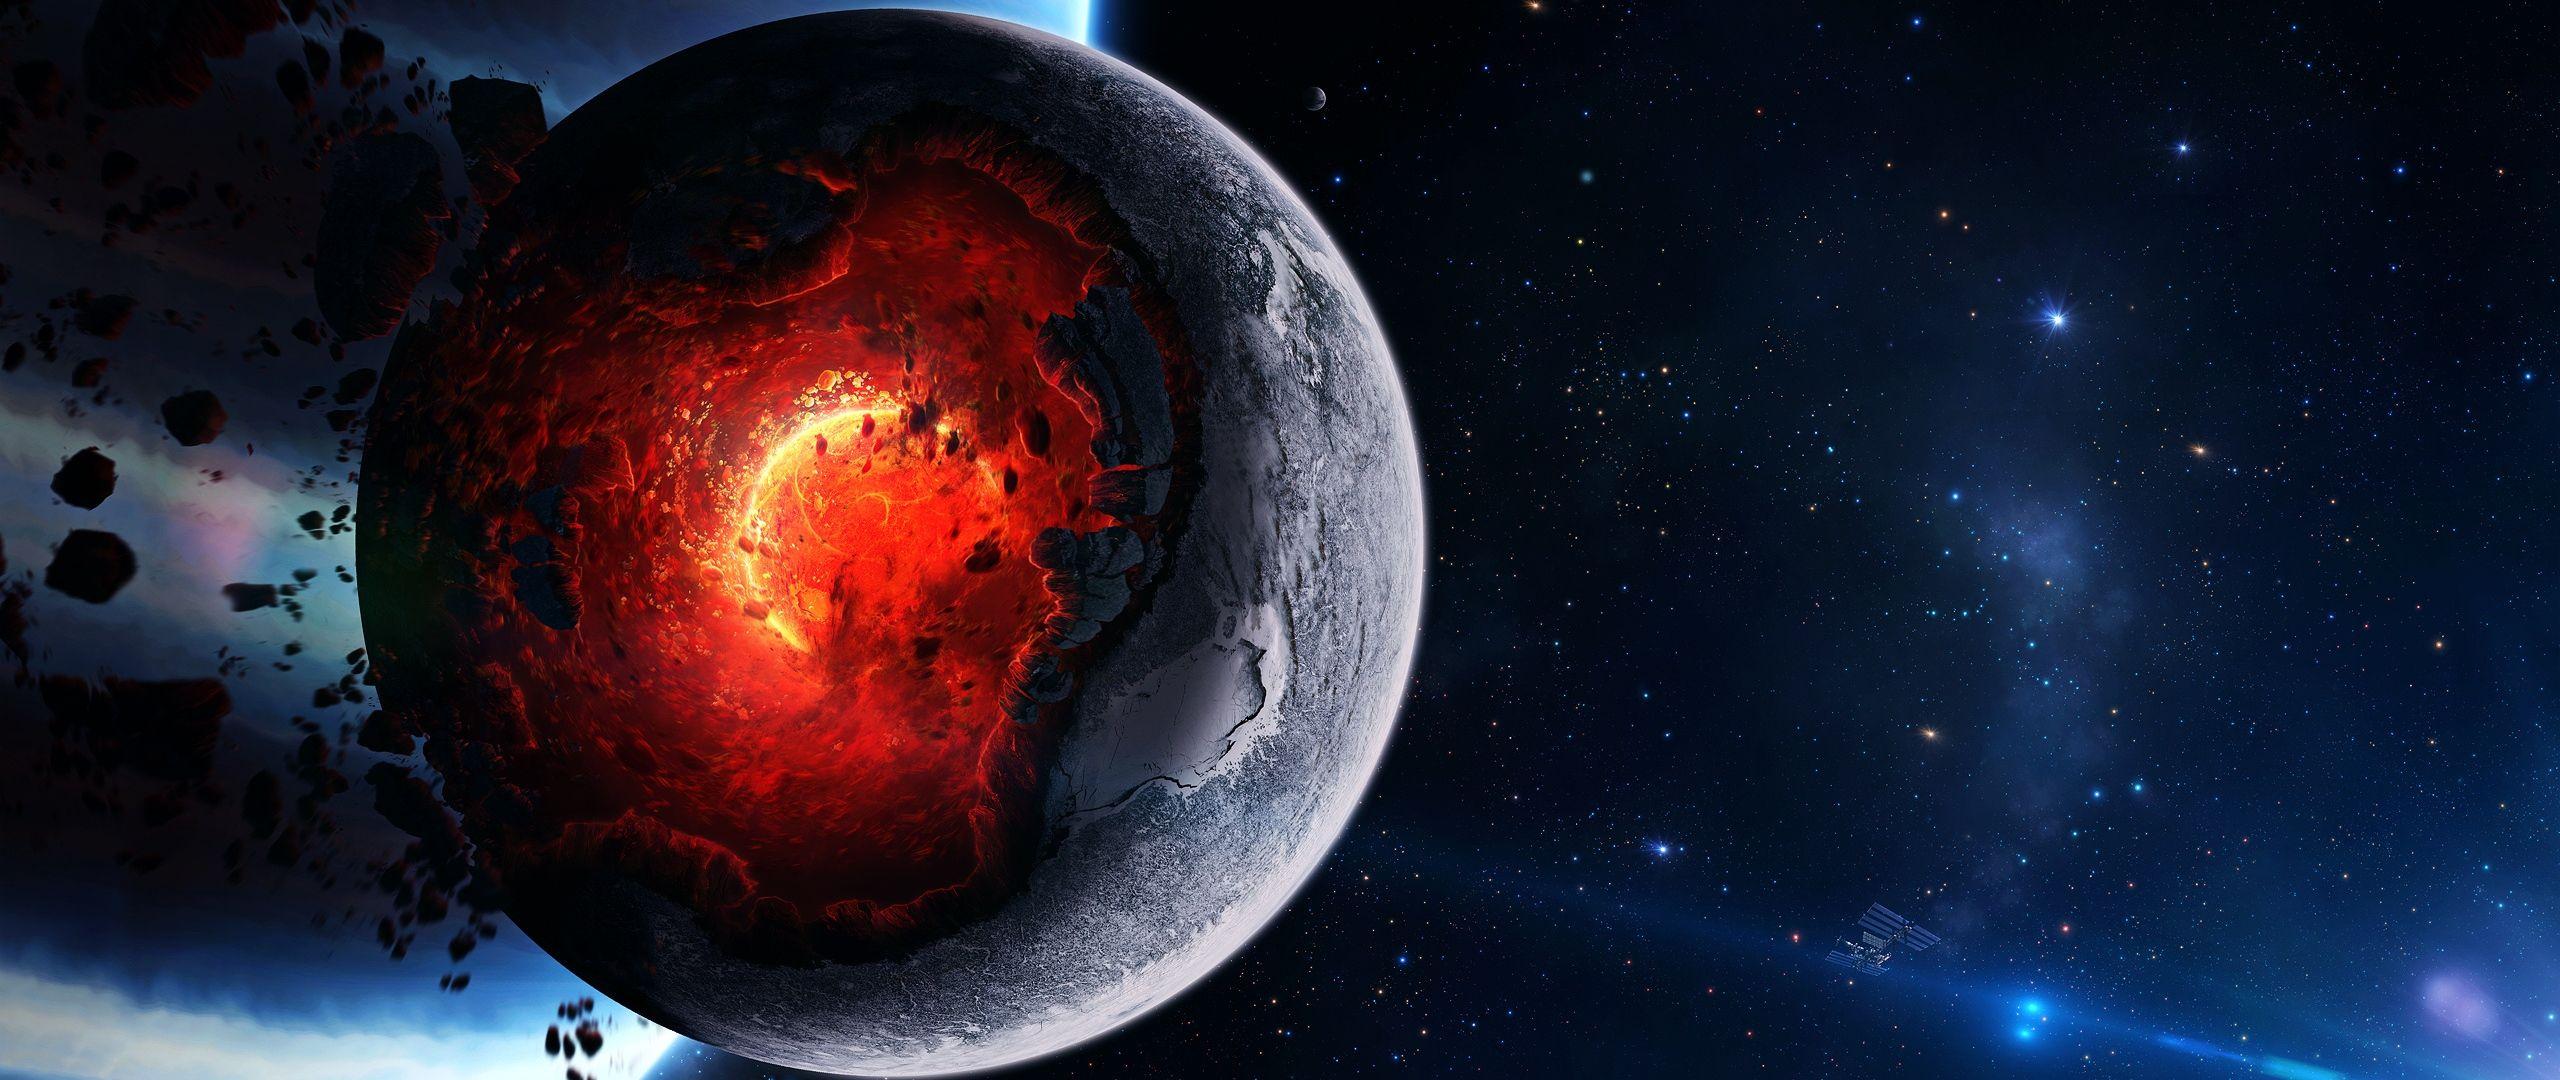 Download Wallpaper 2560x1080 Space Cataclysm Planet Art Explosion Asteroids Comets